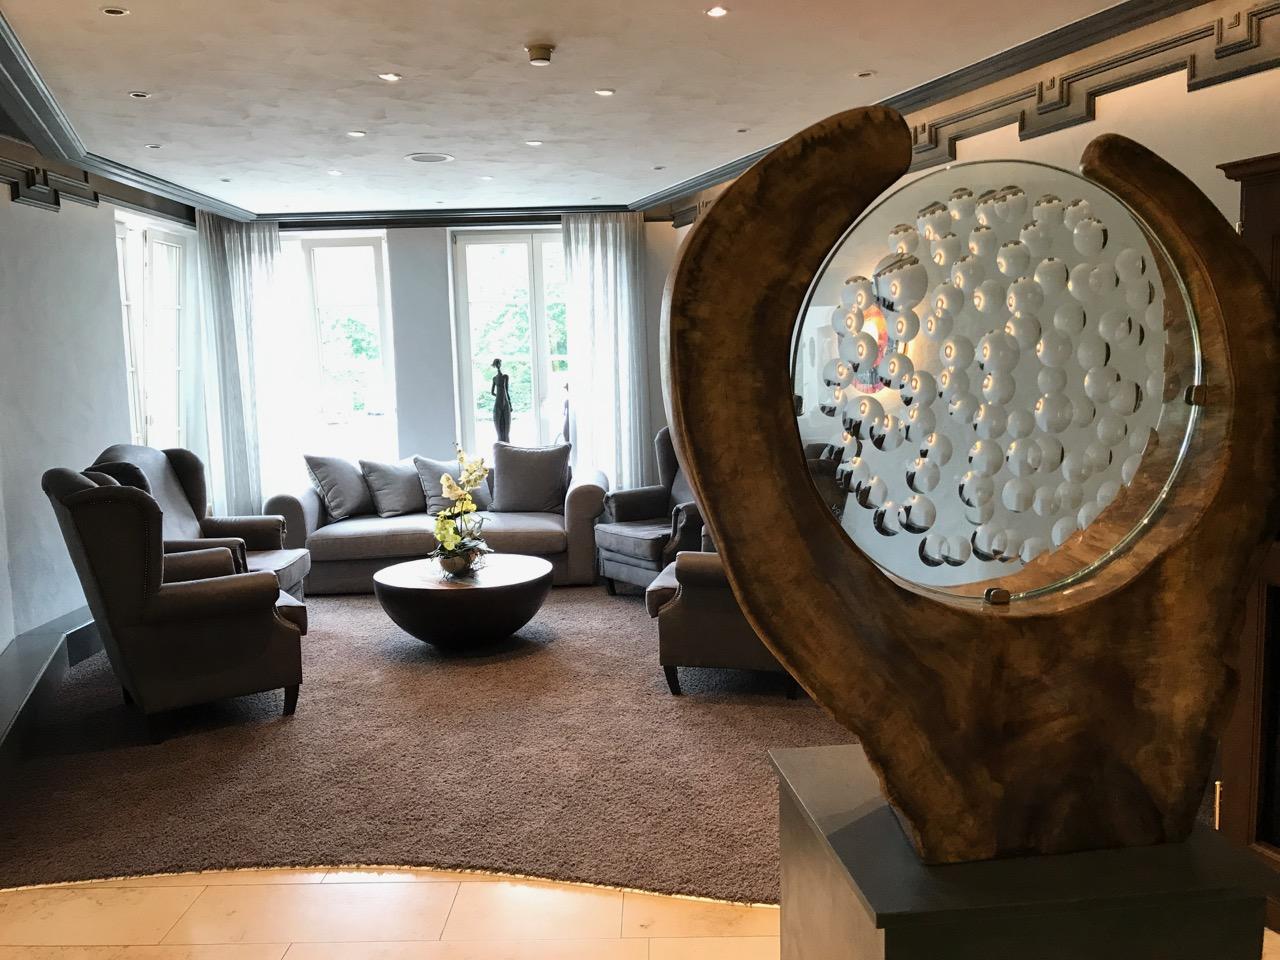 Flair Hotel Nieder